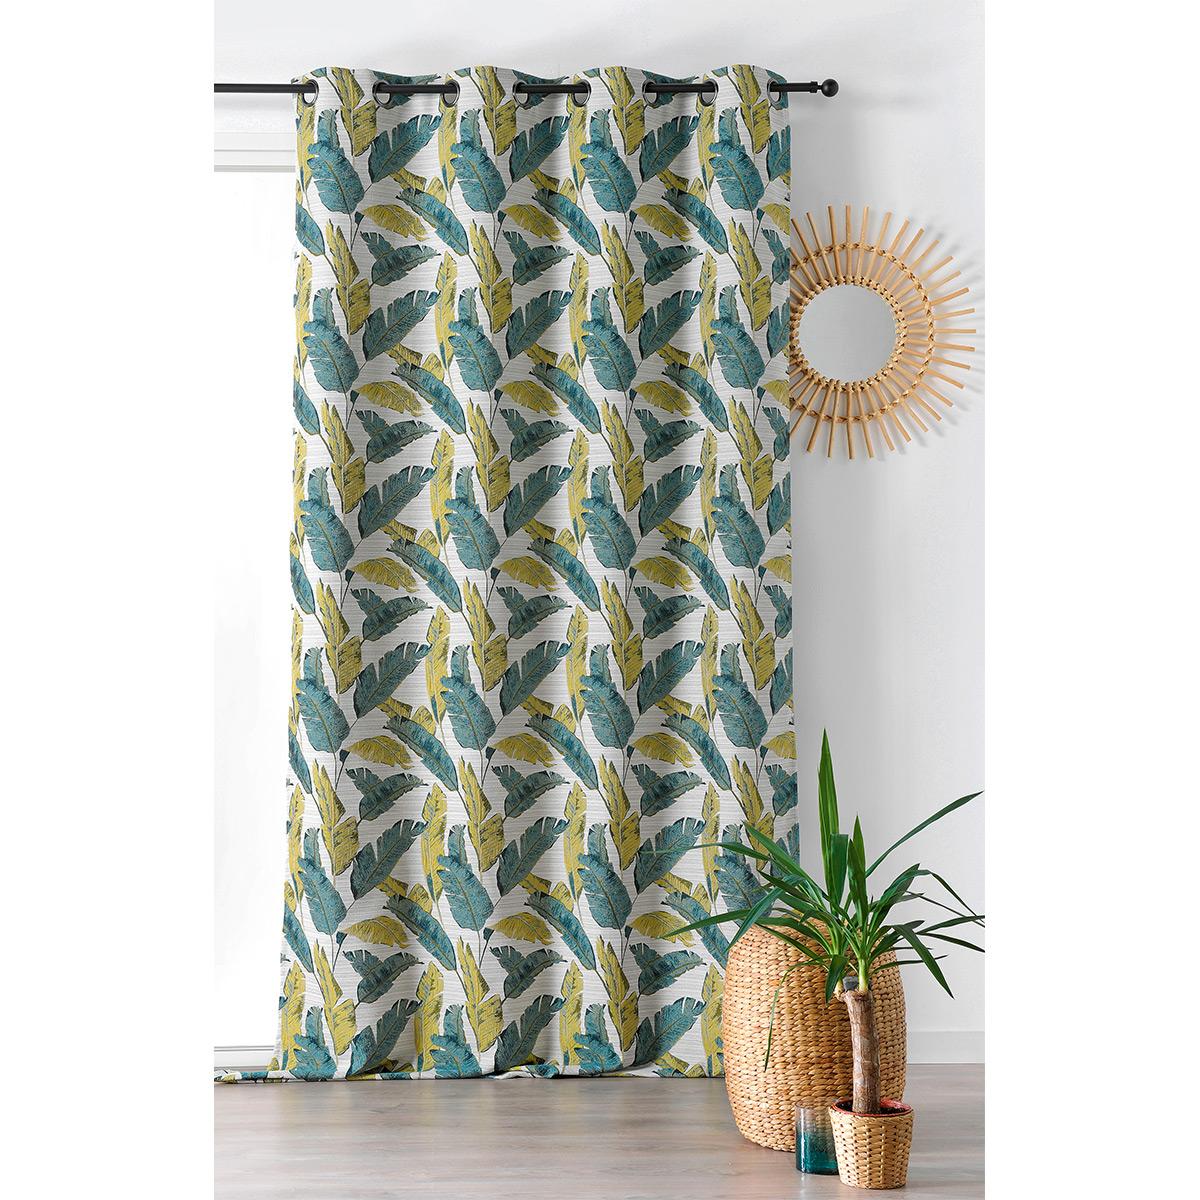 Rideau tamisant à motif plumes polyester vert 240x135